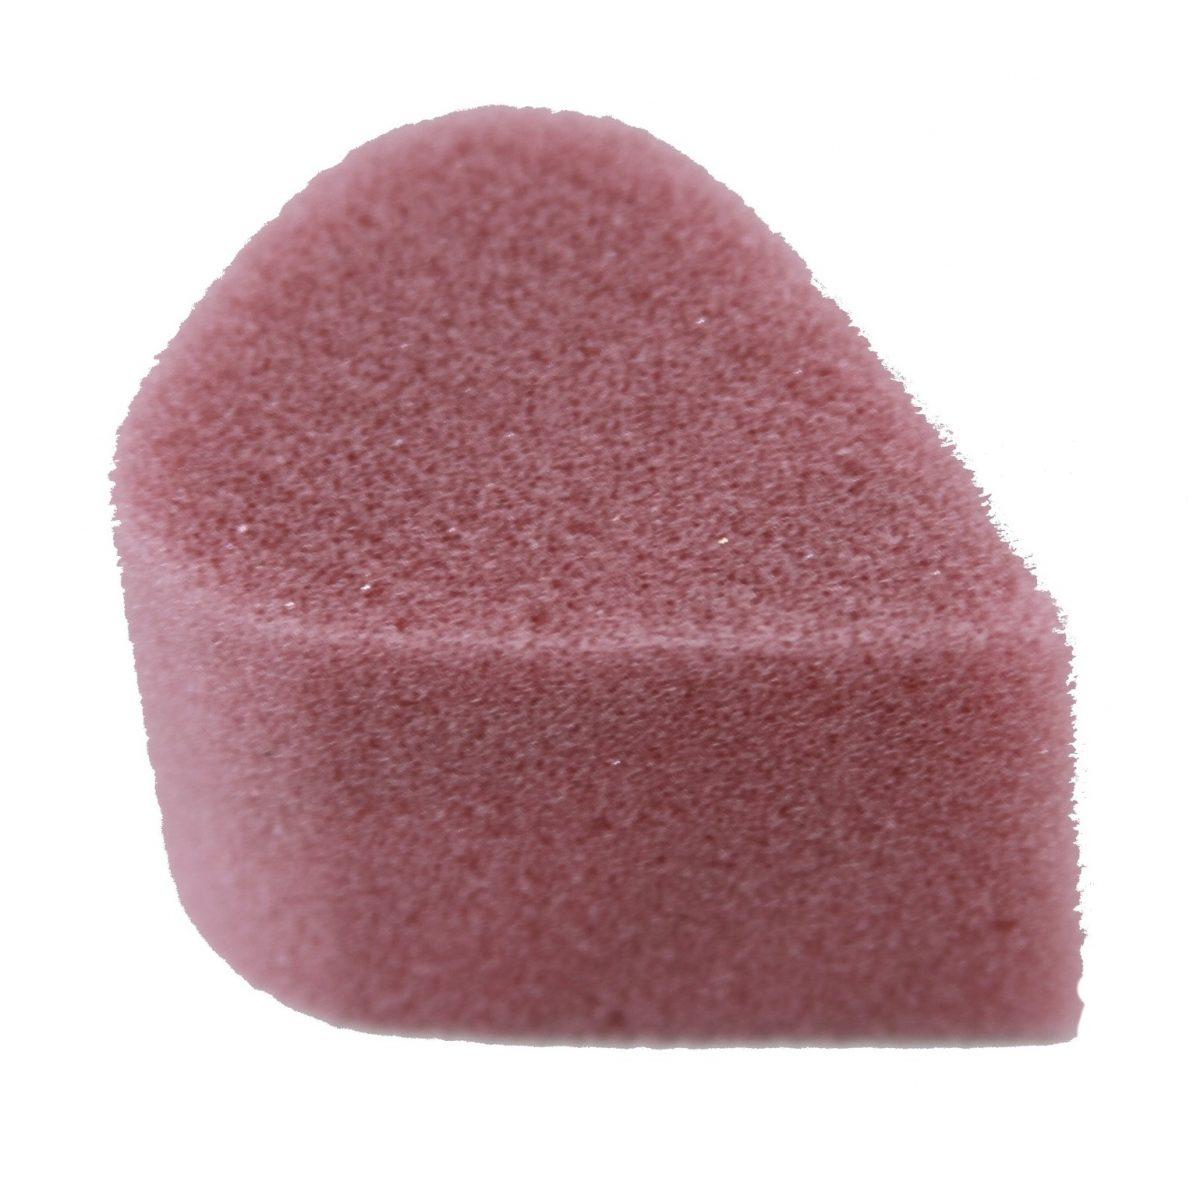 TAG Body Art Medium Density Petal Face Painting Sponges - 6 Pack